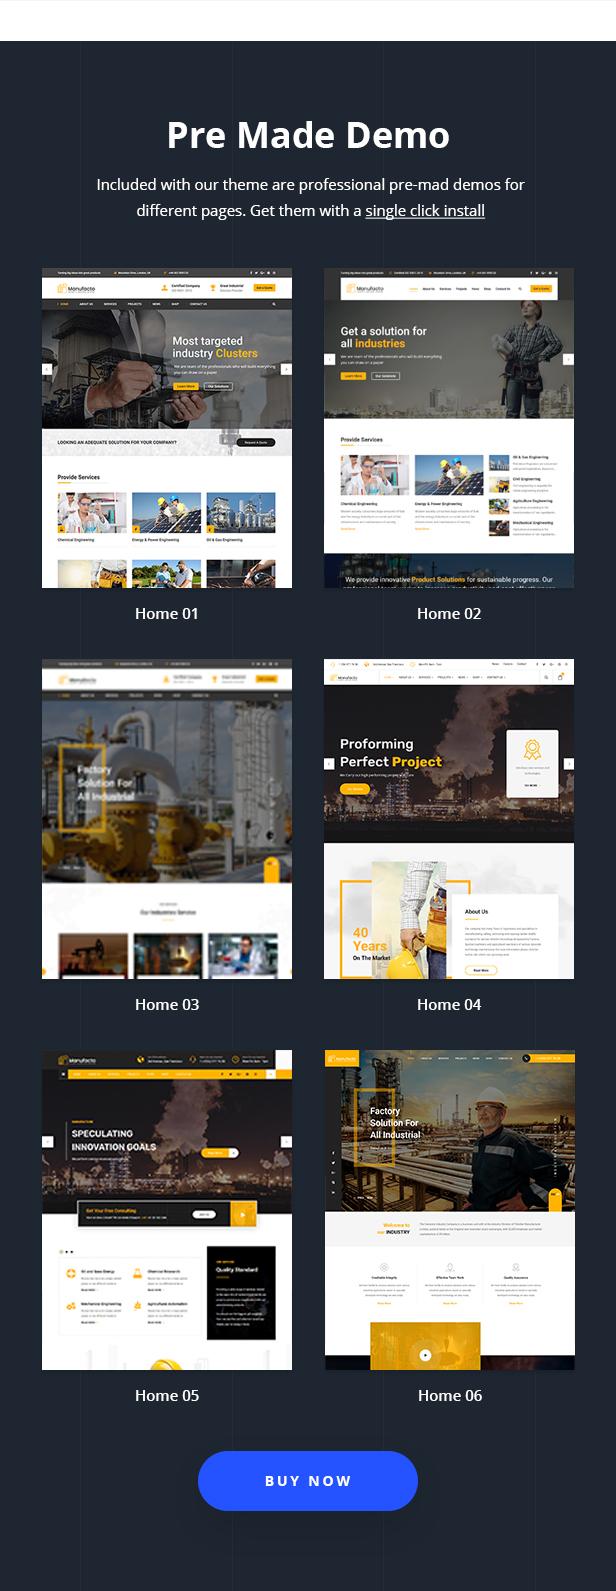 Manufacto Factory & Industrial WordPress Theme - 3